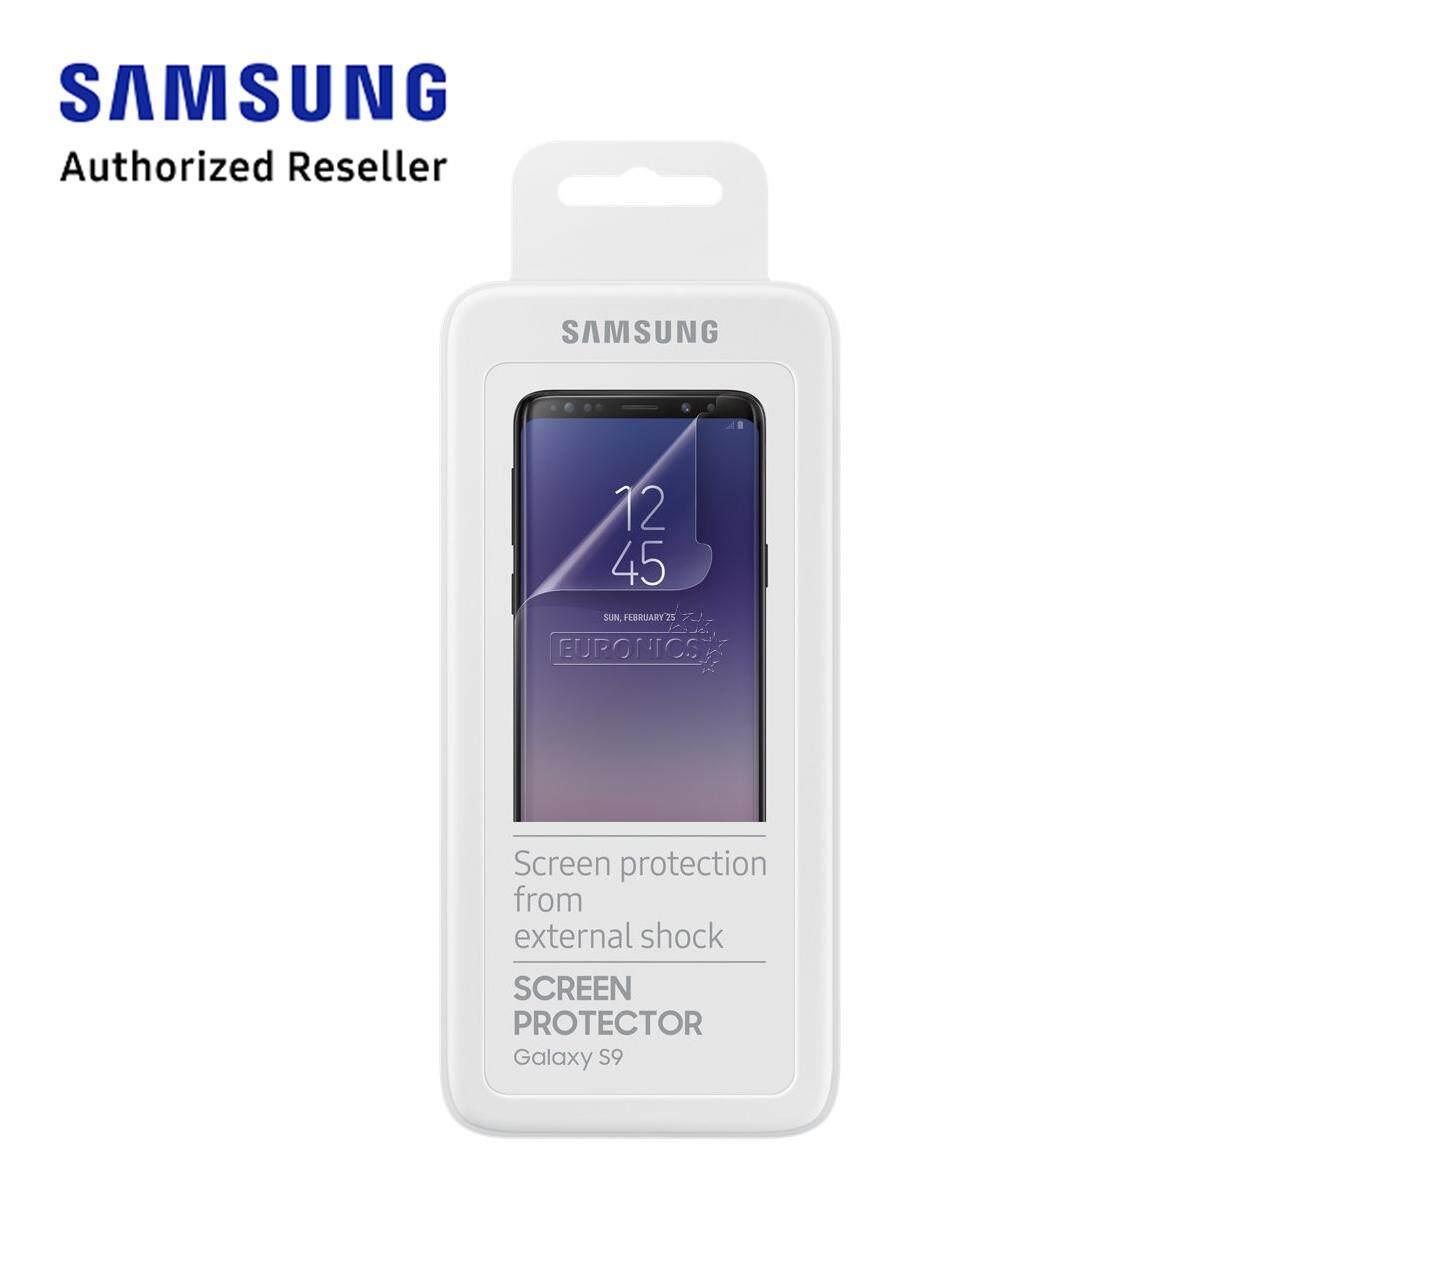 SAMSUNG S9 SCREEN PROTECTOR ( 2PCS IN 1 BOX )